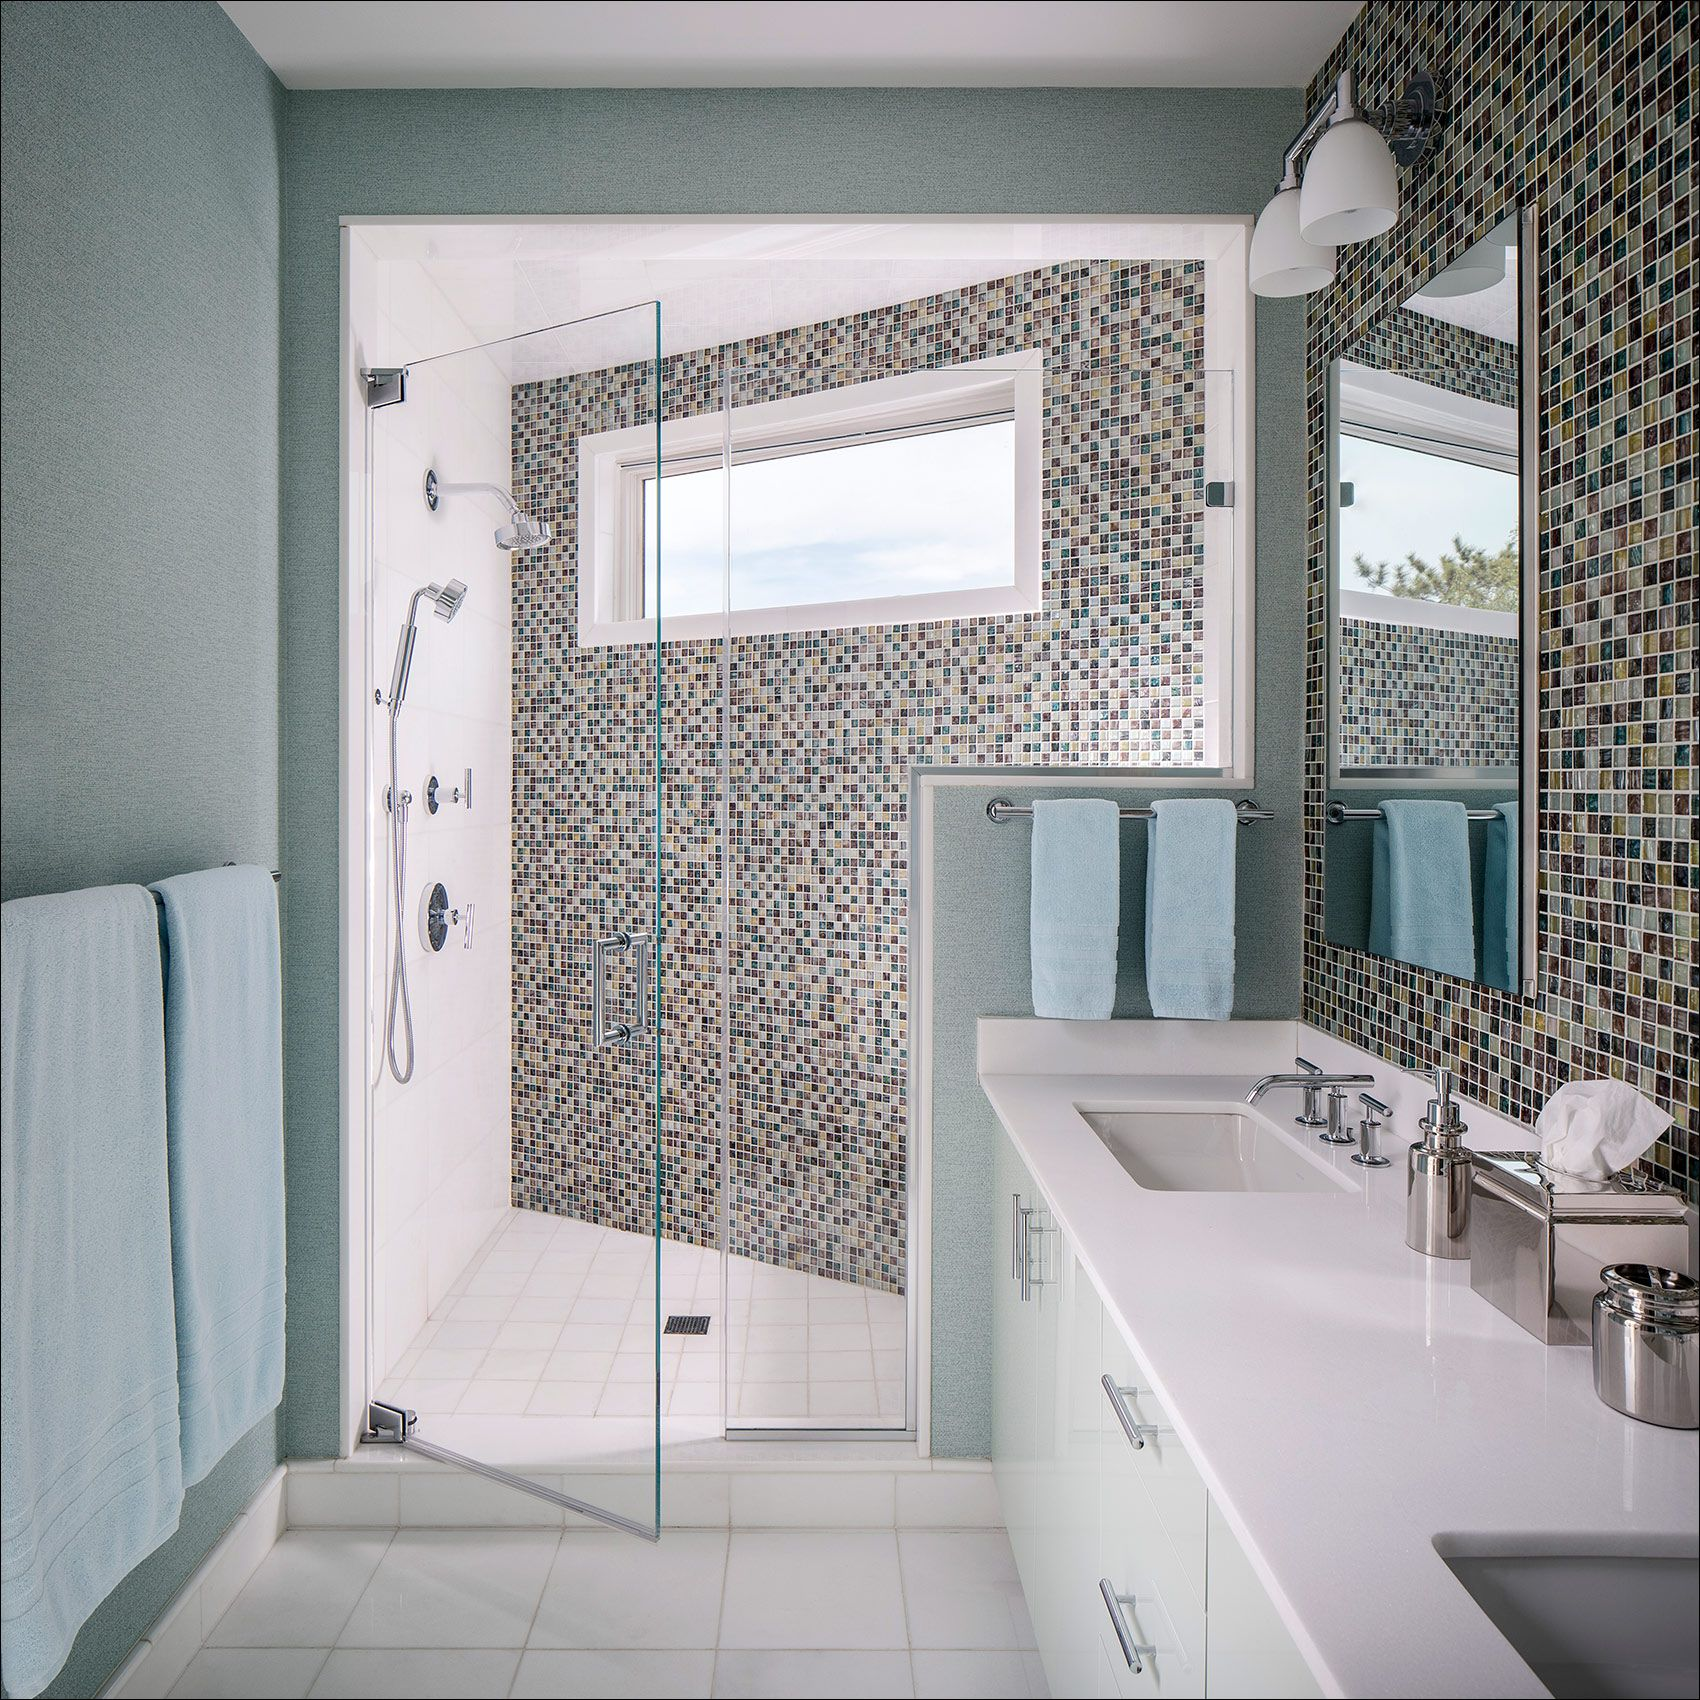 HerbertInterior_Hamptons_NewYork_Glasstile_Bathroom.jpg